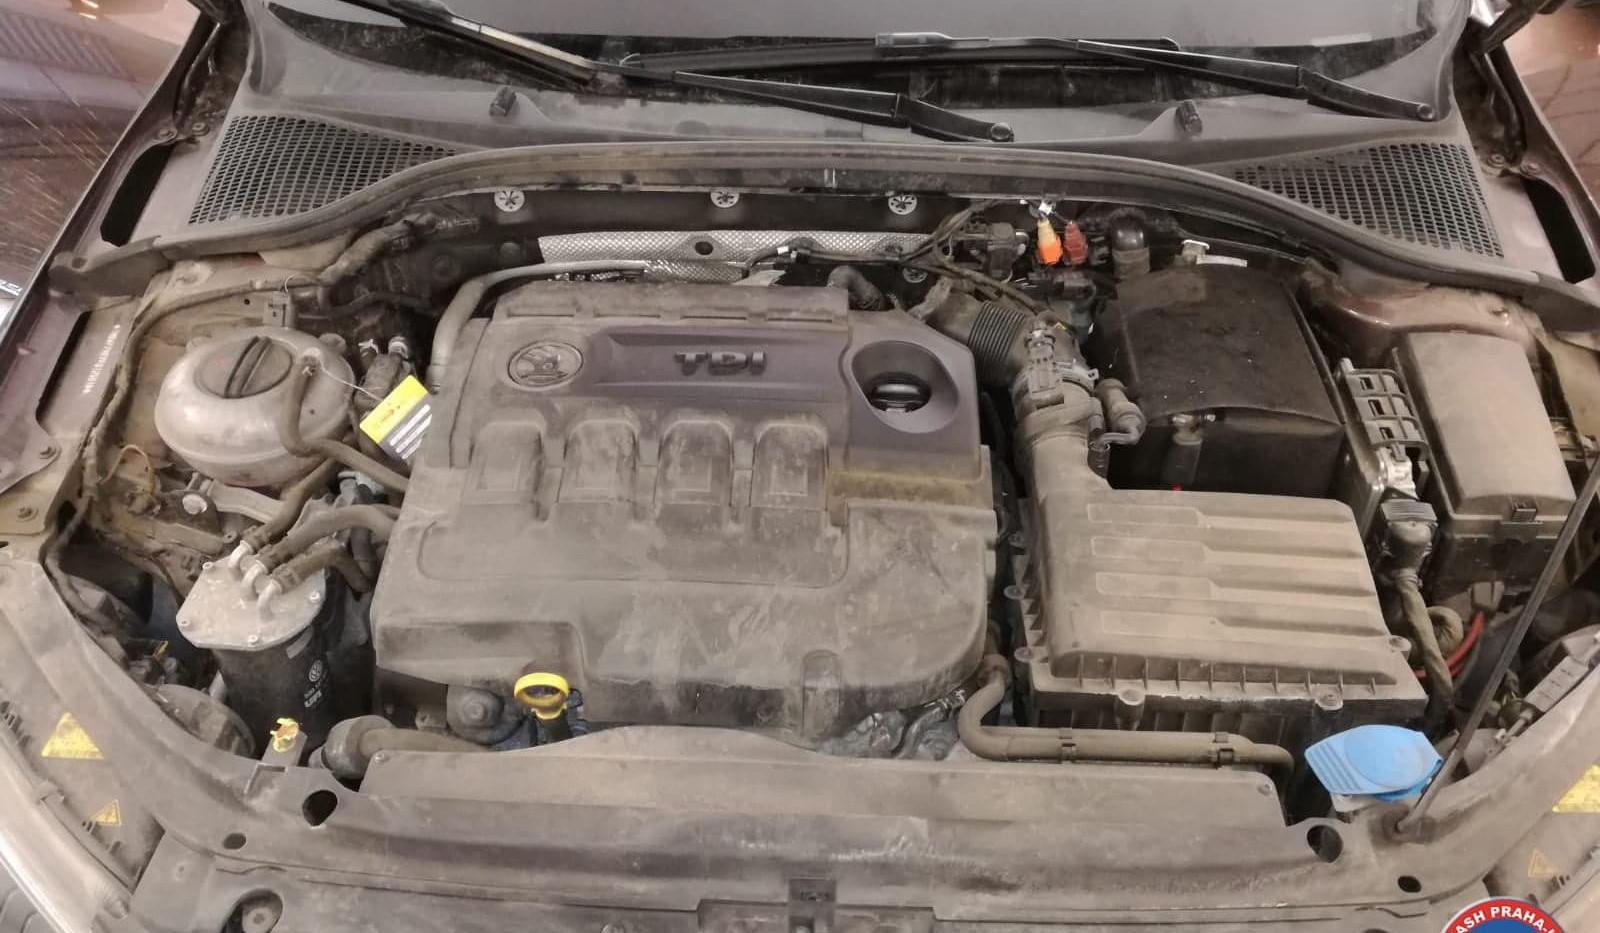 Car Wash - Cisteni motoru (5).jpg